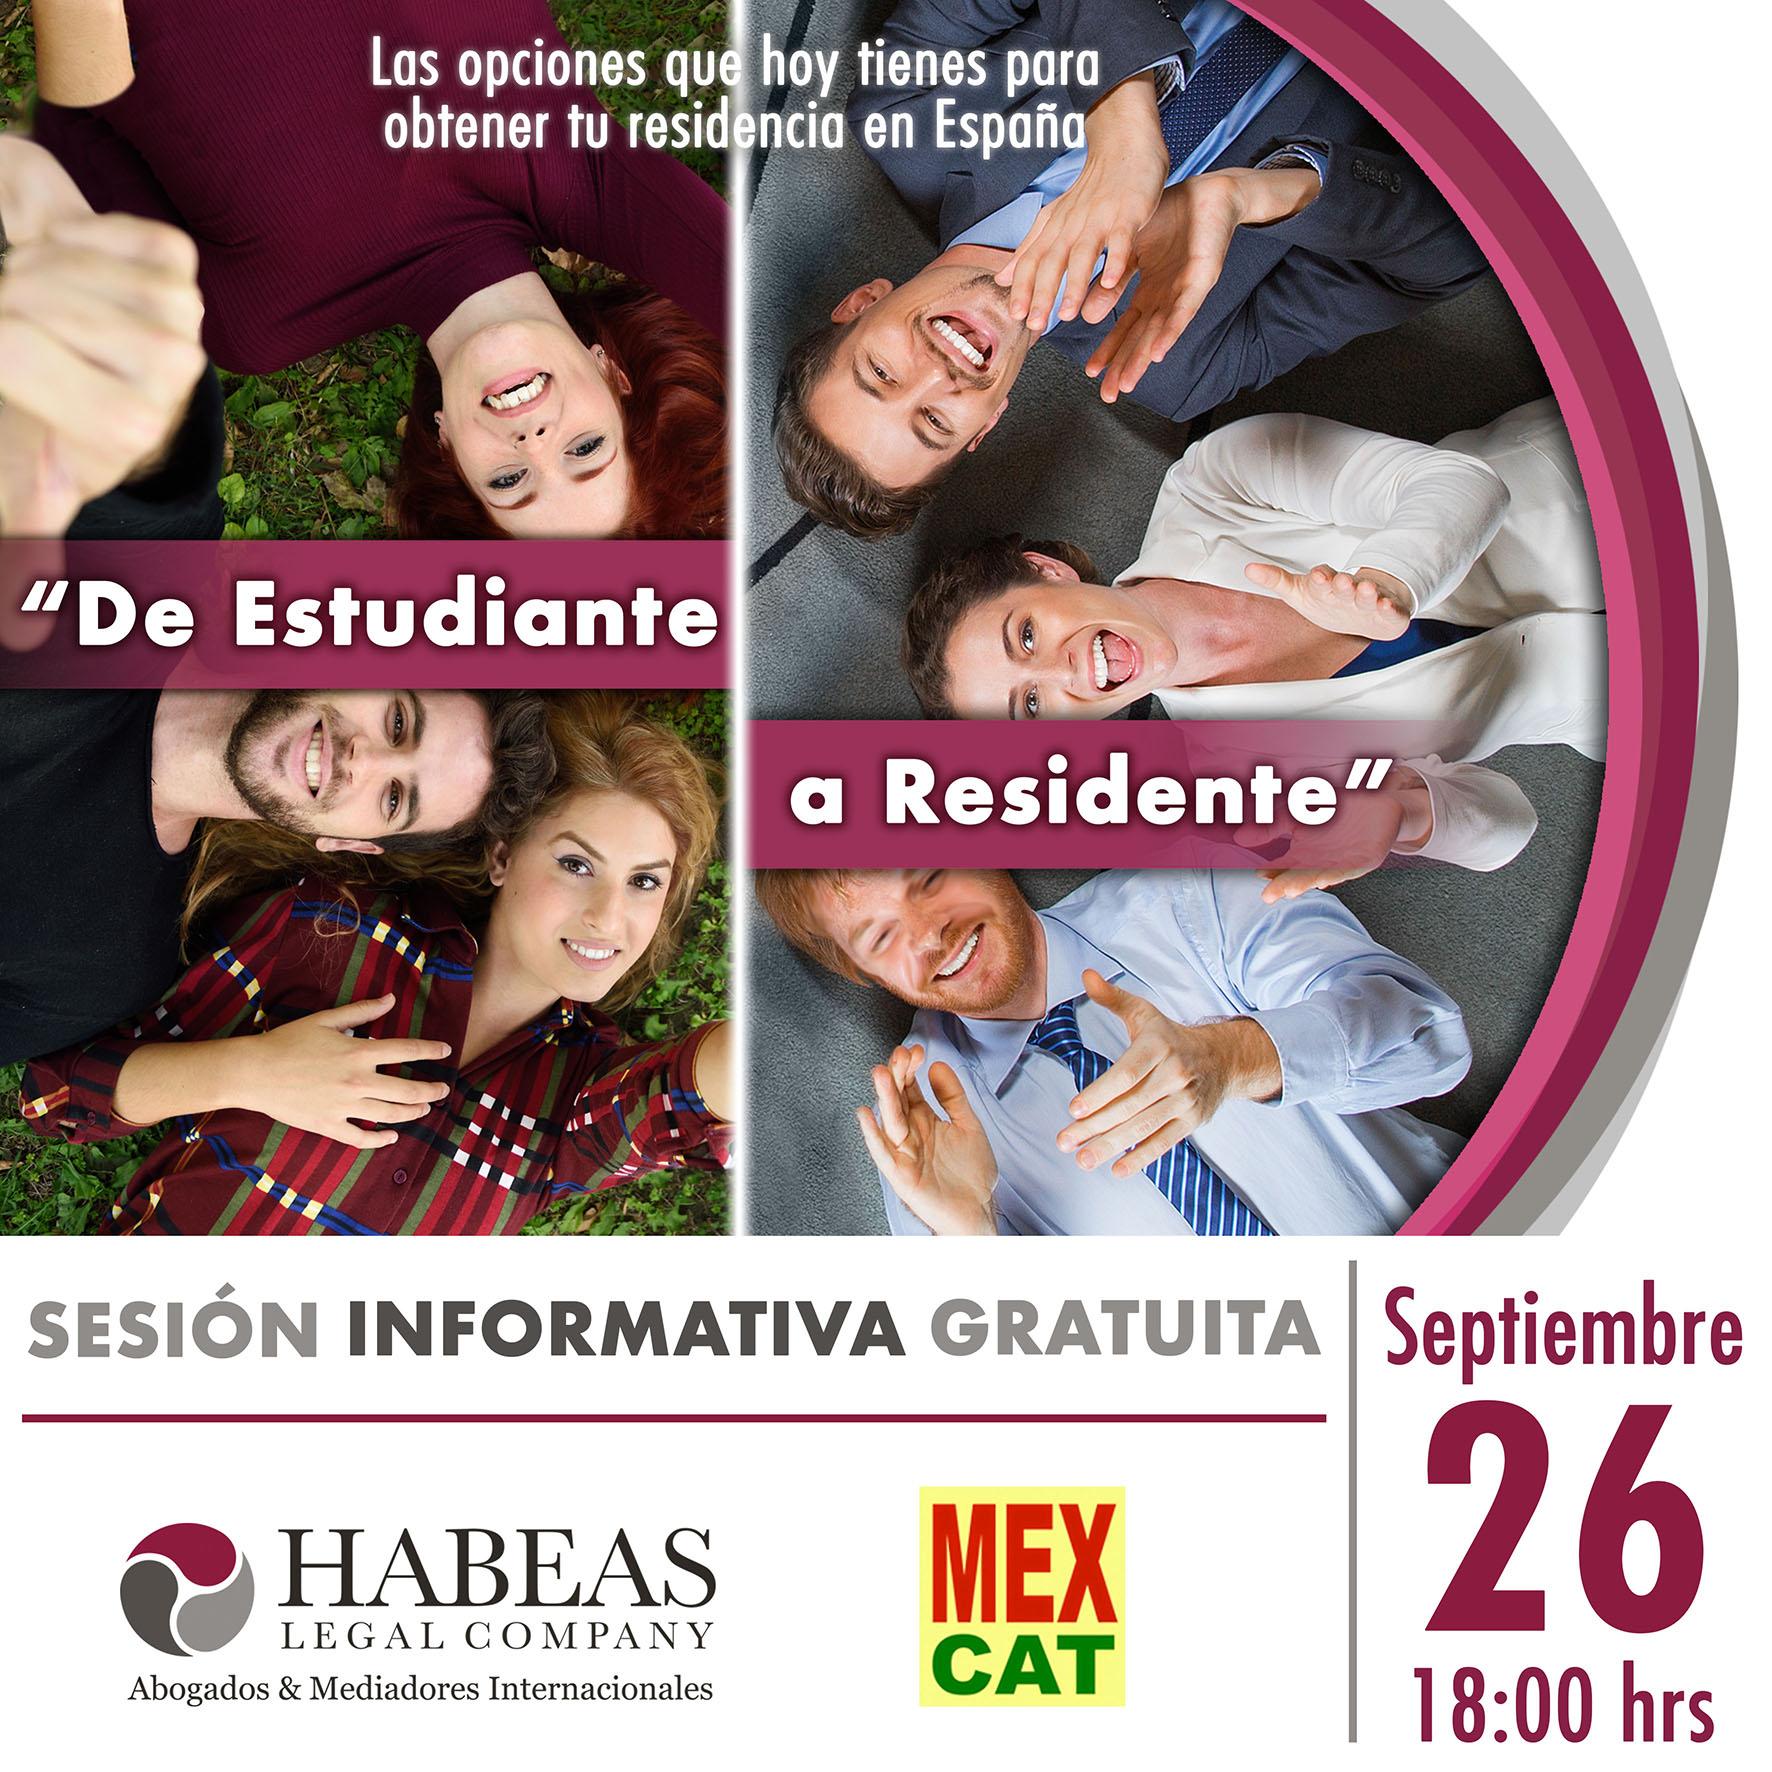 "De Estudiante a Residente 2019 calendar SEPT - ""De Estudiante a Residente"" - sesión Septiembre 2019"